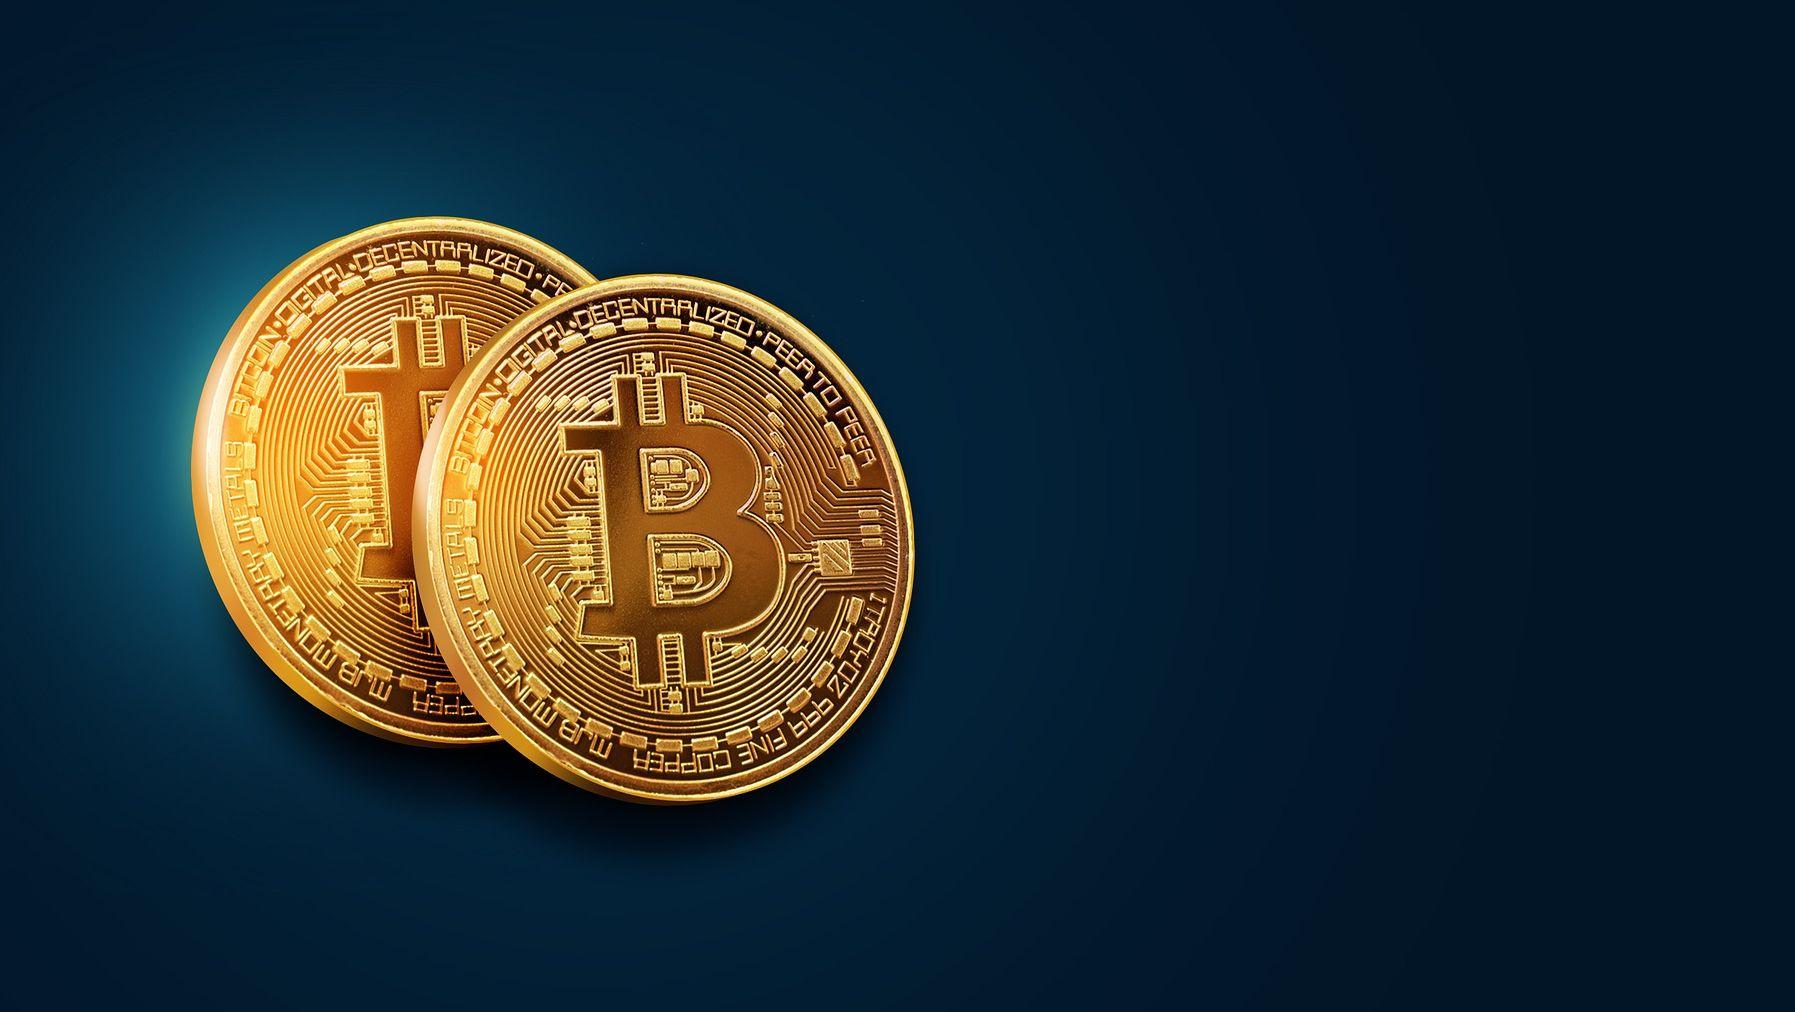 Det lagres barneporno i blockchainen til Bitcoin.